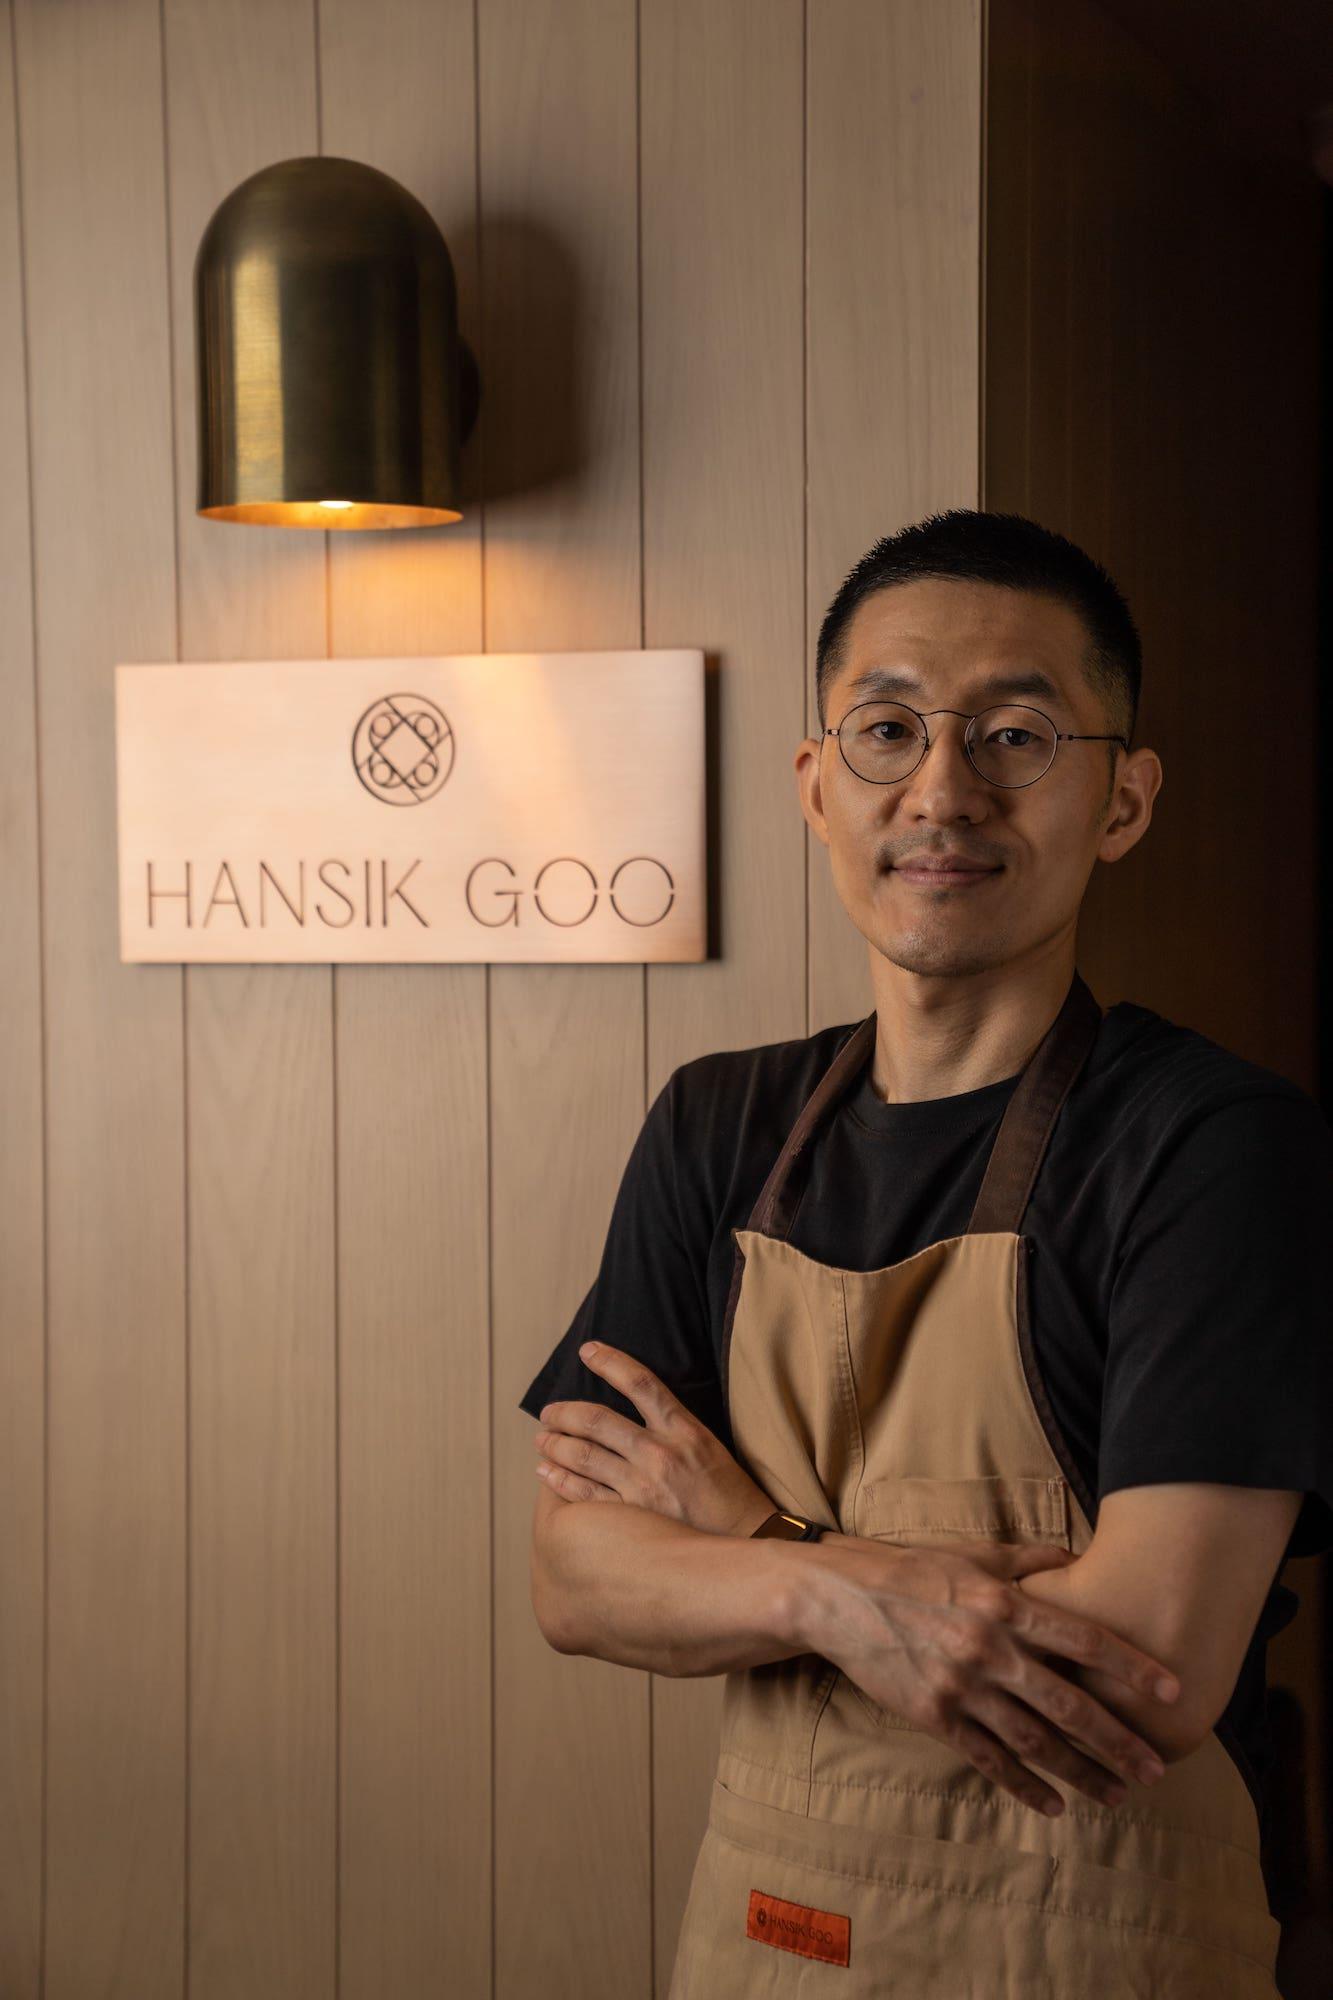 Chef Mingoo Kang-mingles-hansik-goo.jpg